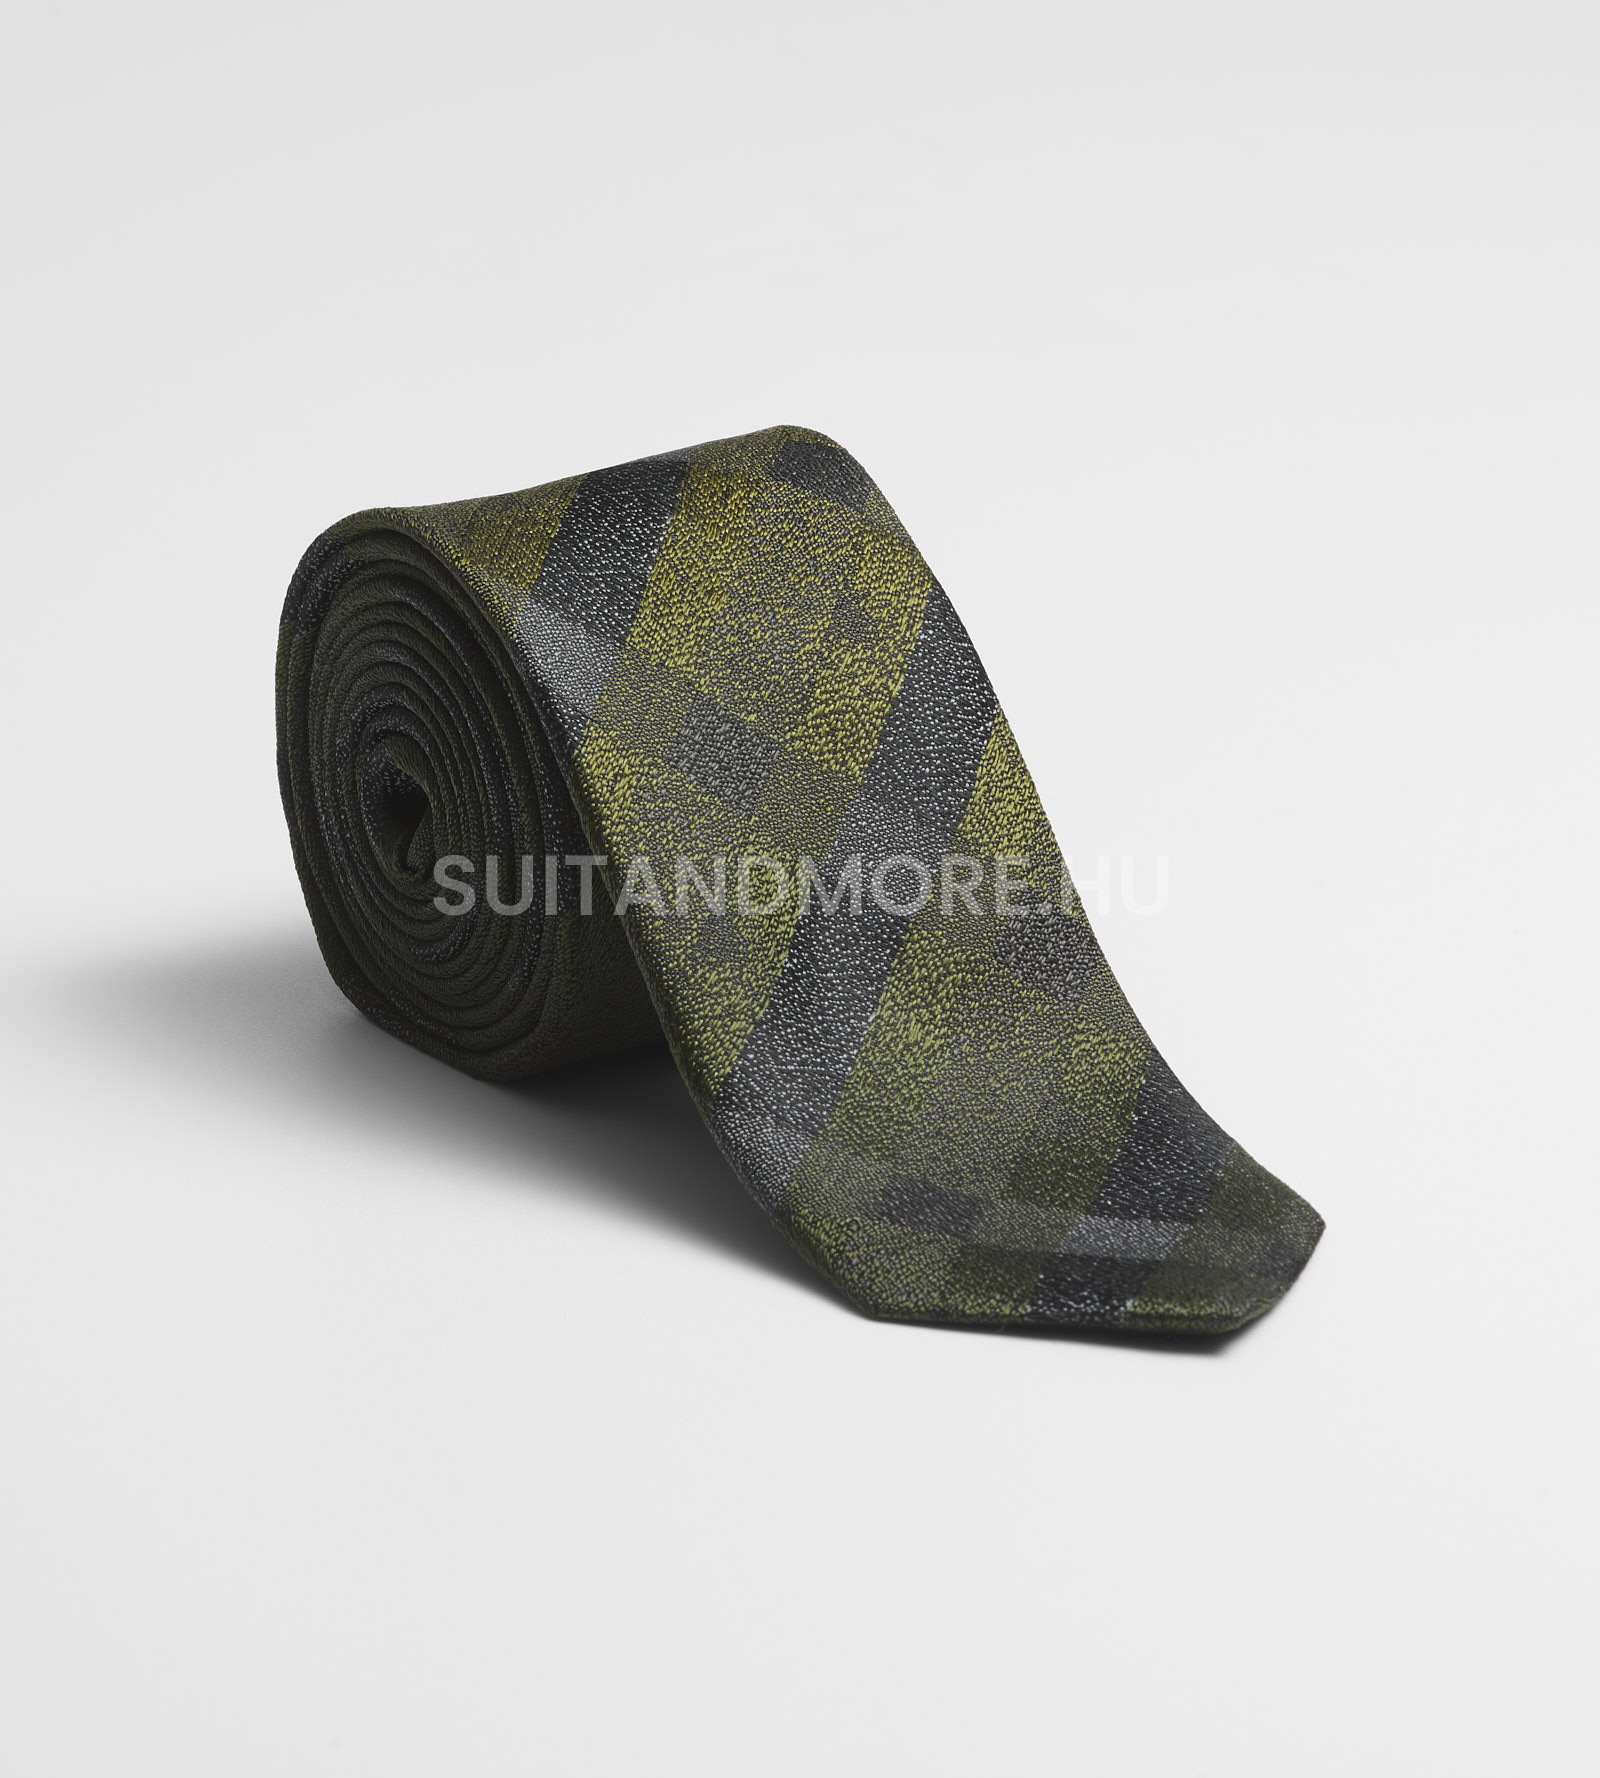 digel-zold-kockas-selyem-nyakkendo-dunhill-1269015-50-01